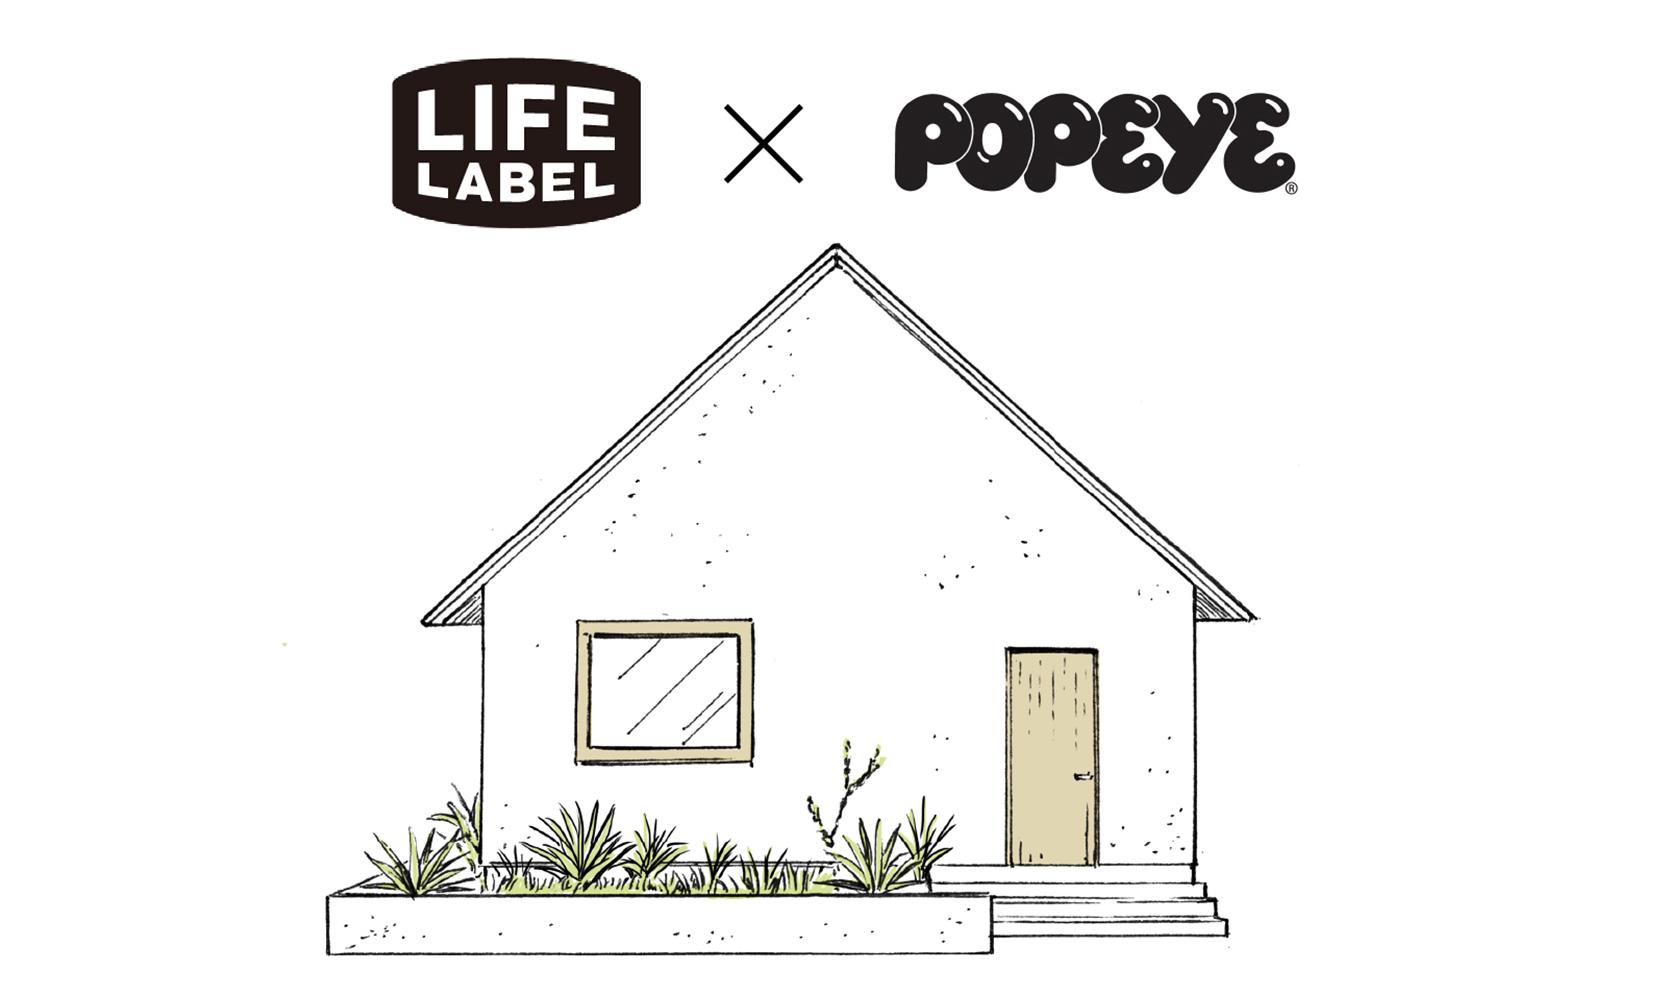 LIFE LABEL x《POPEYE》共同开发房屋建造企划